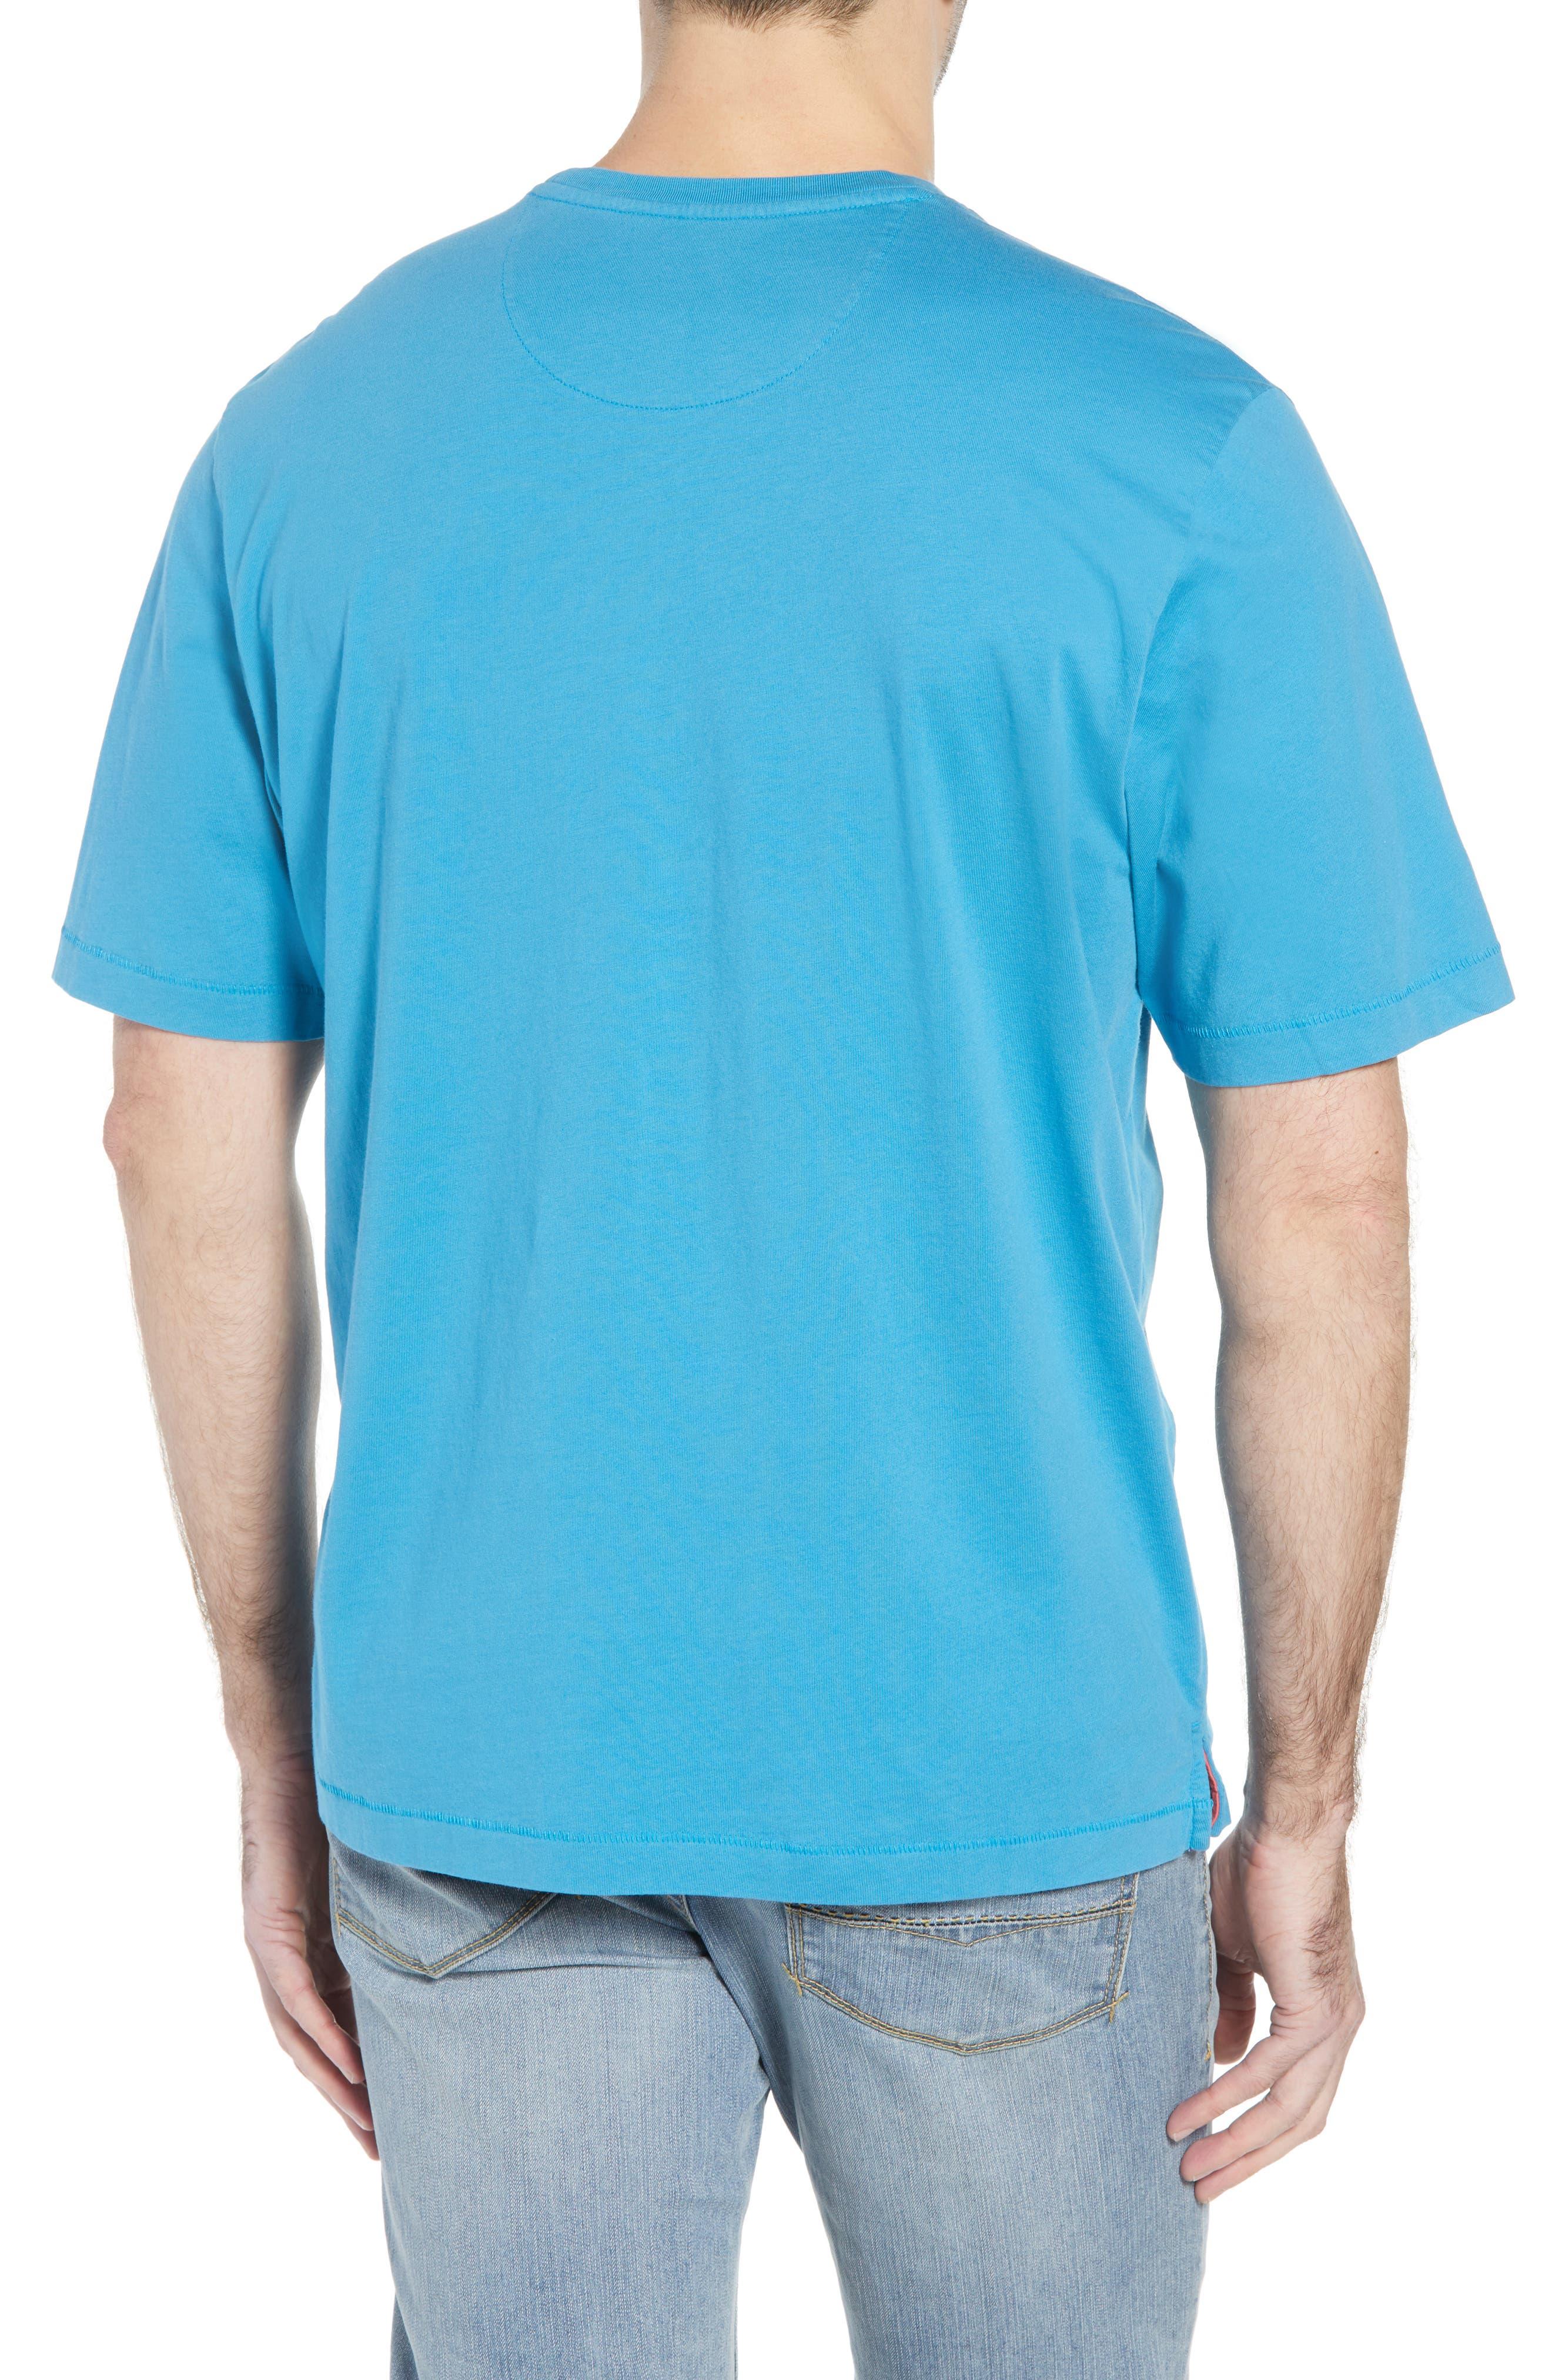 TOMMY BAHAMA,                             New Bali Sky Pima Cotton Pocket T-Shirt,                             Alternate thumbnail 2, color,                             410